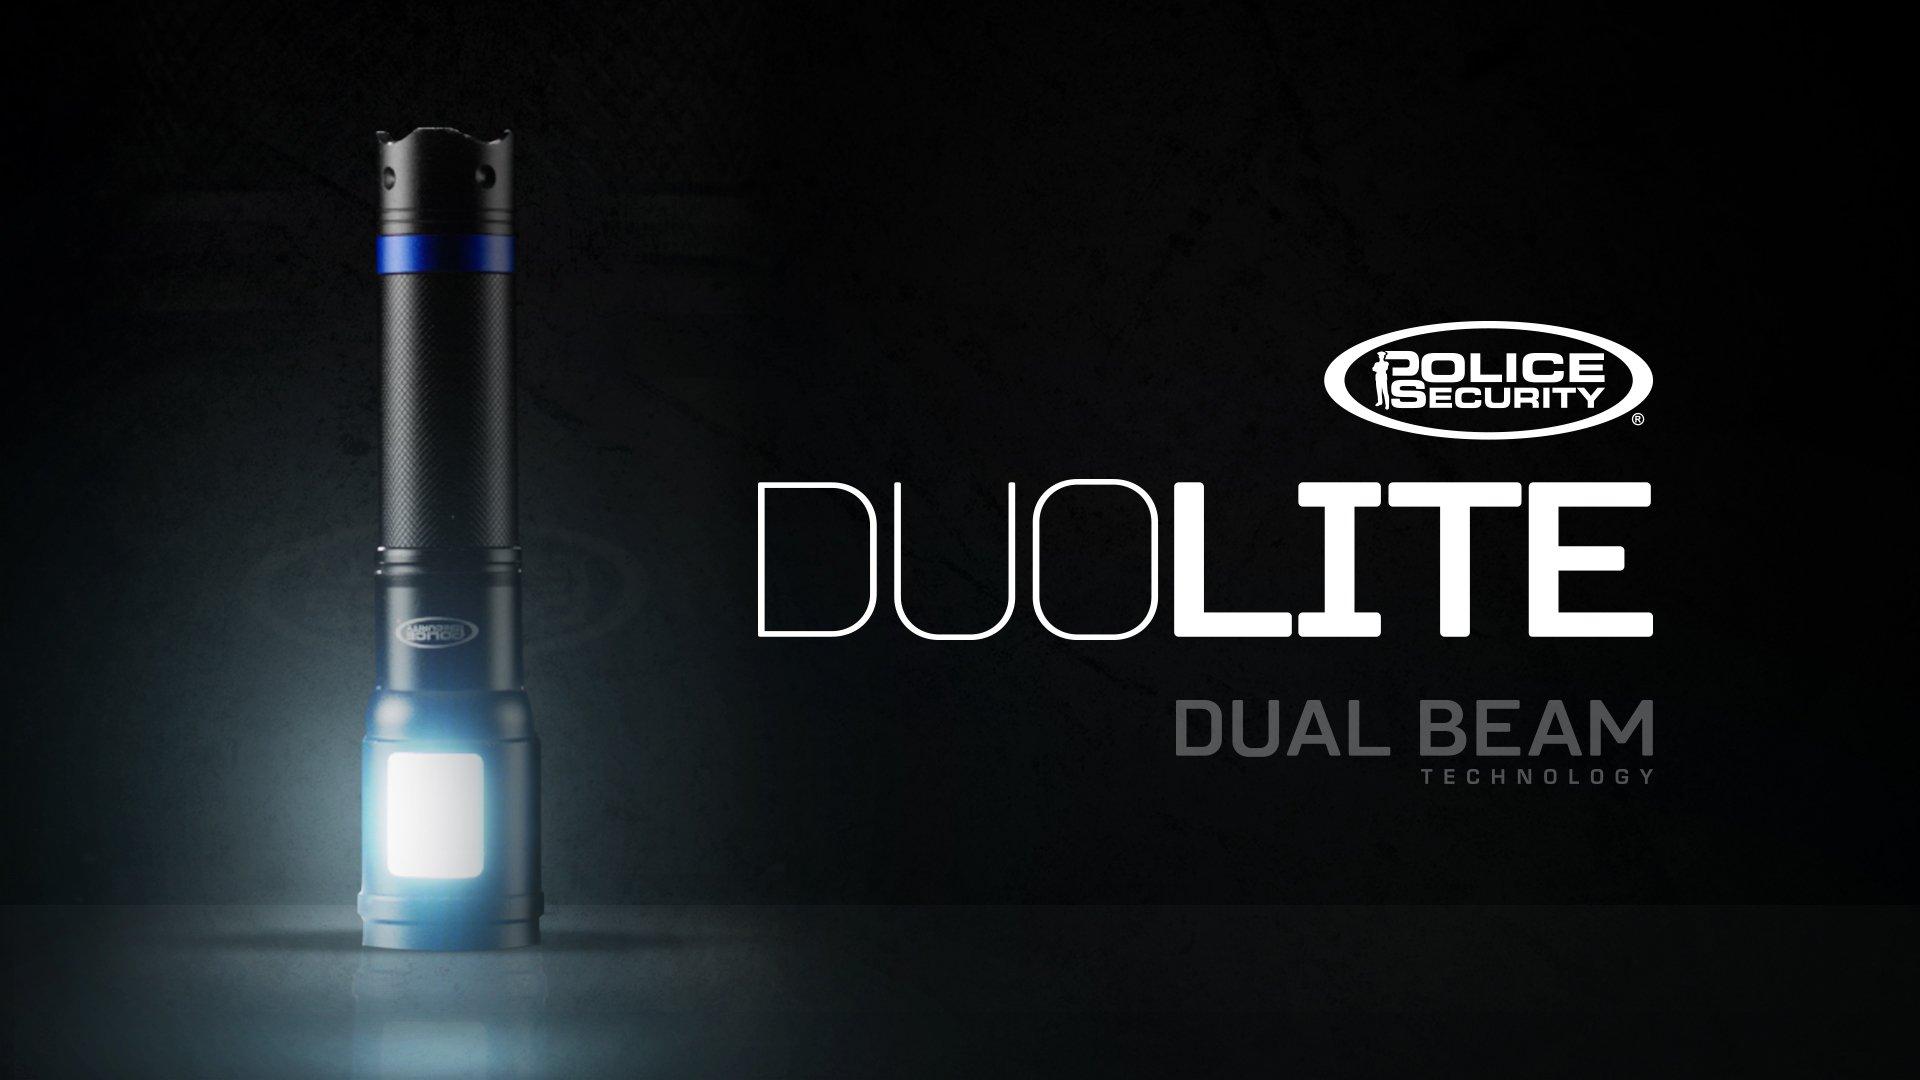 Police Security DuoLite 3AAA - Ultra Bright- Cree LED - Dual Utility Work Flashlight (Spotlight Beam and Area Light) - 300 Lumens - Everyday Use - Dog Walking, Hiking - Lights Your Path by Police Security Flashlights (Image #8)